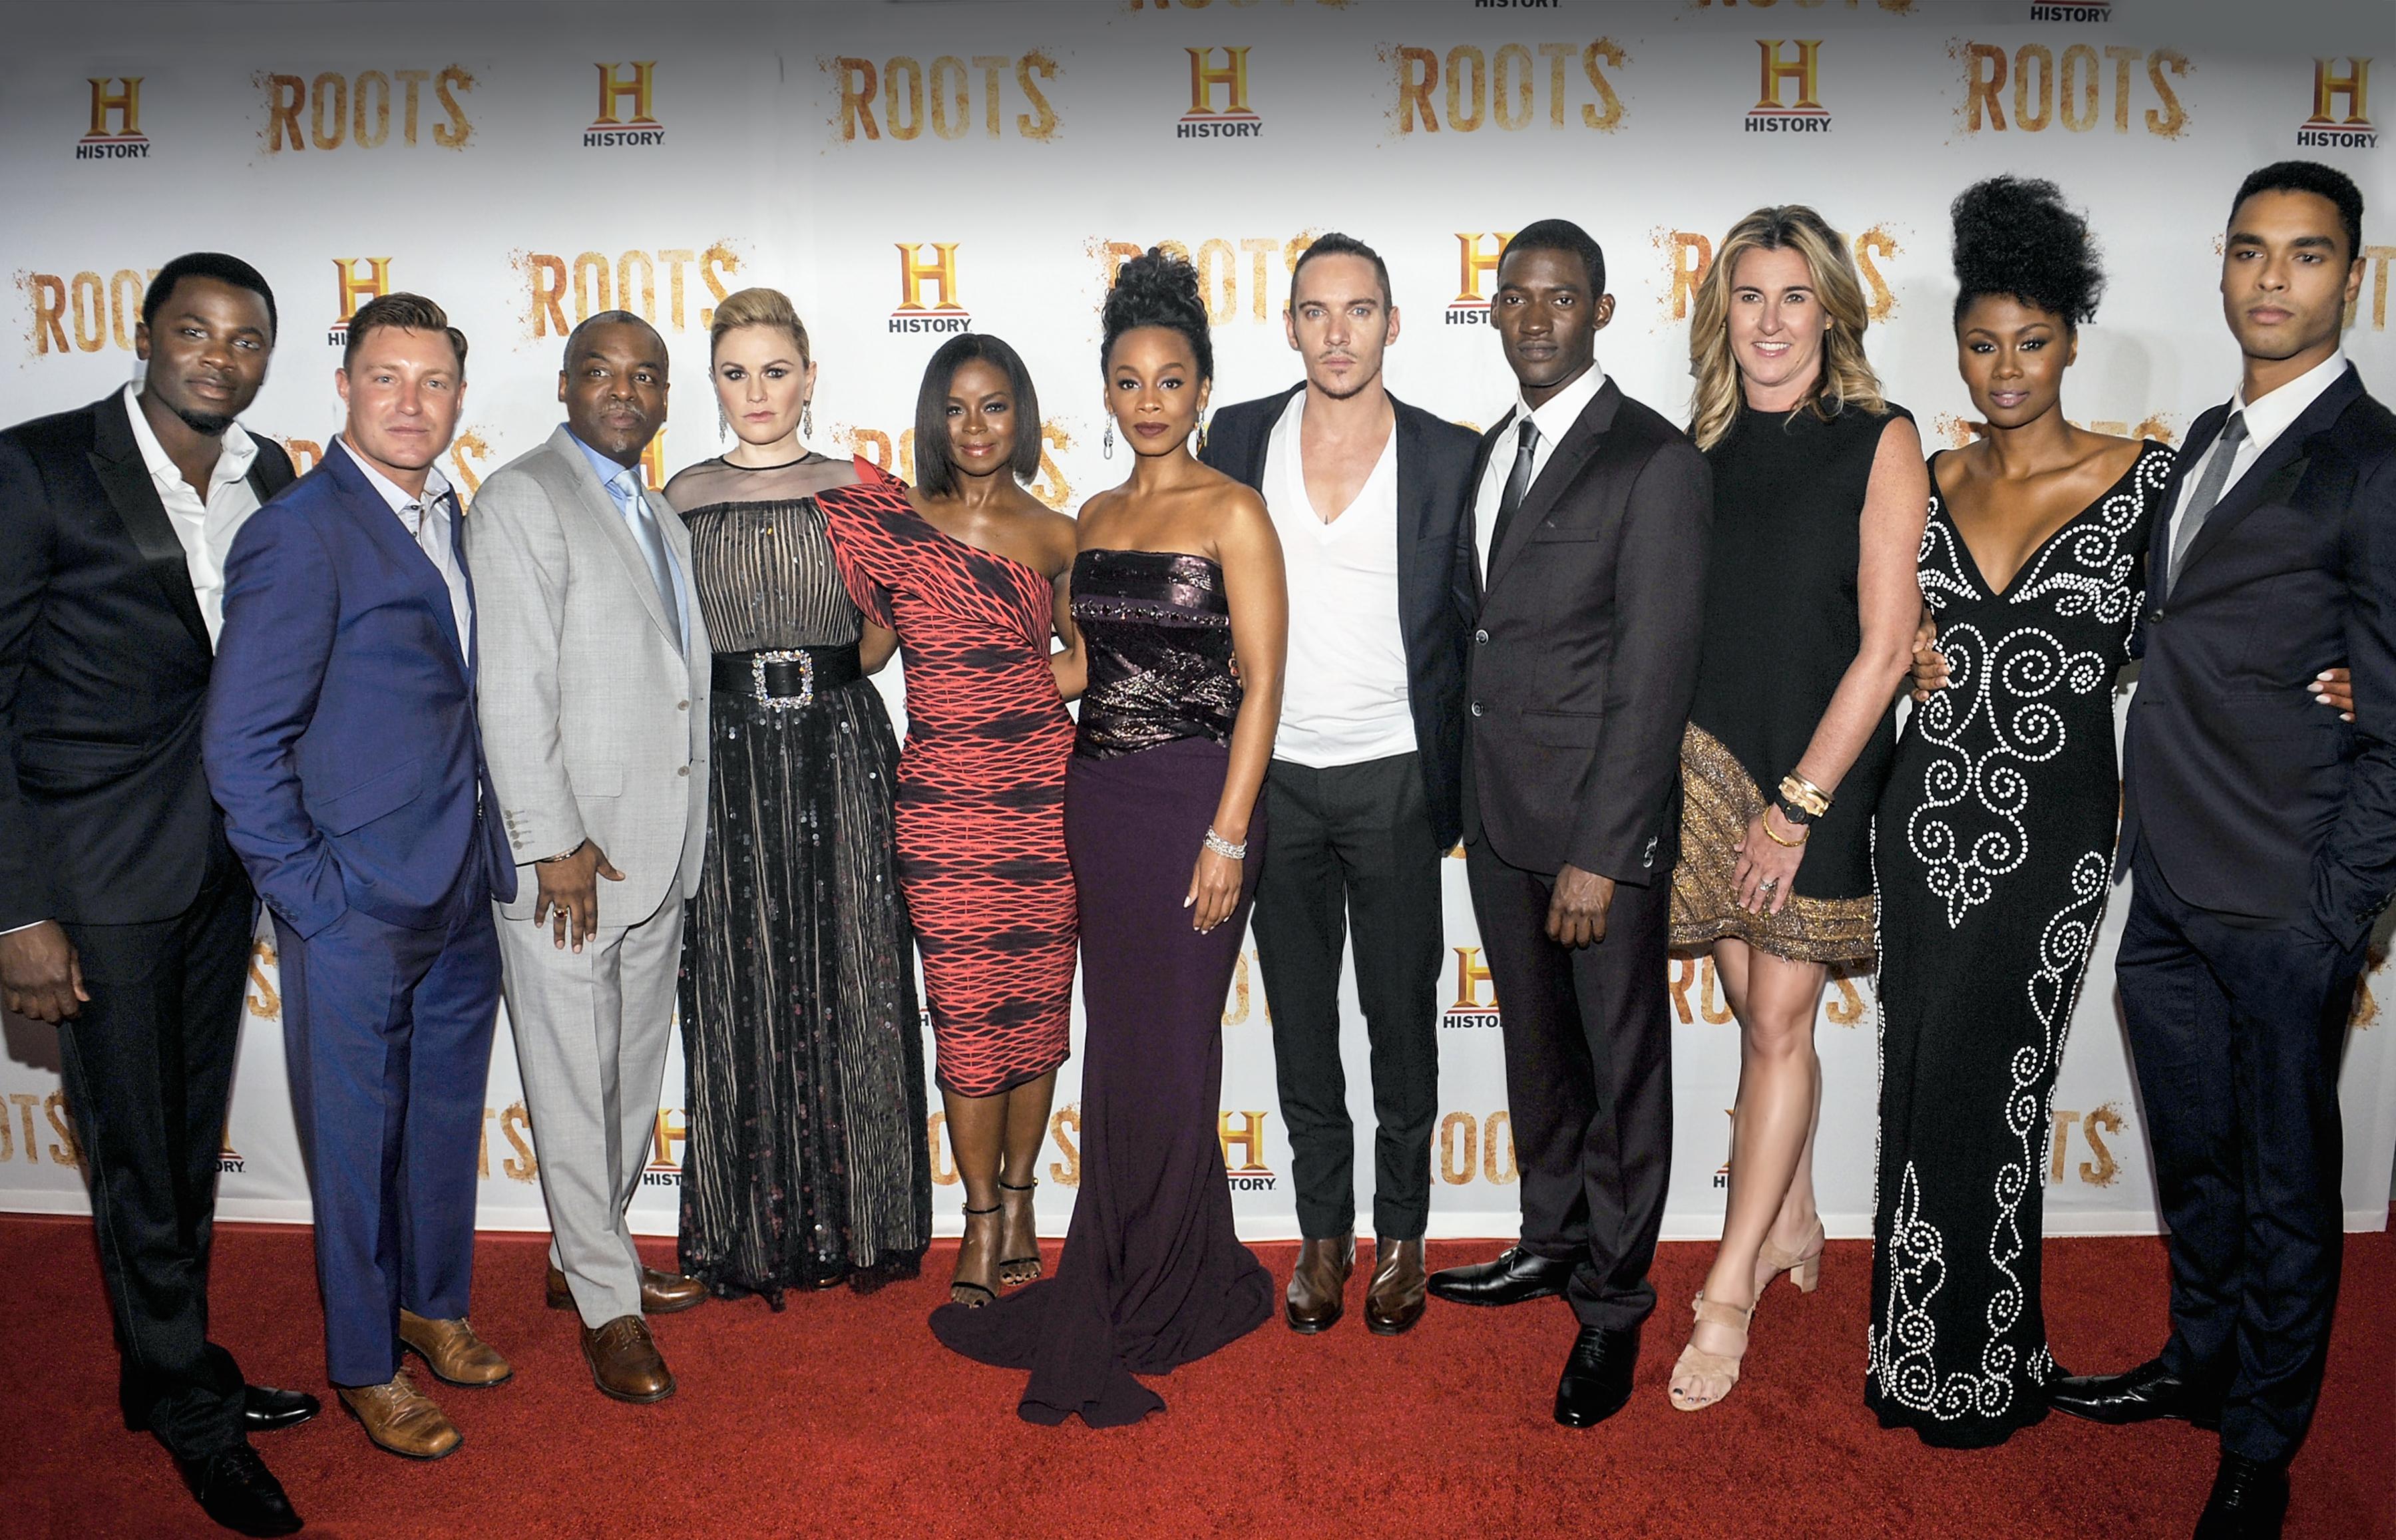 Roots cast